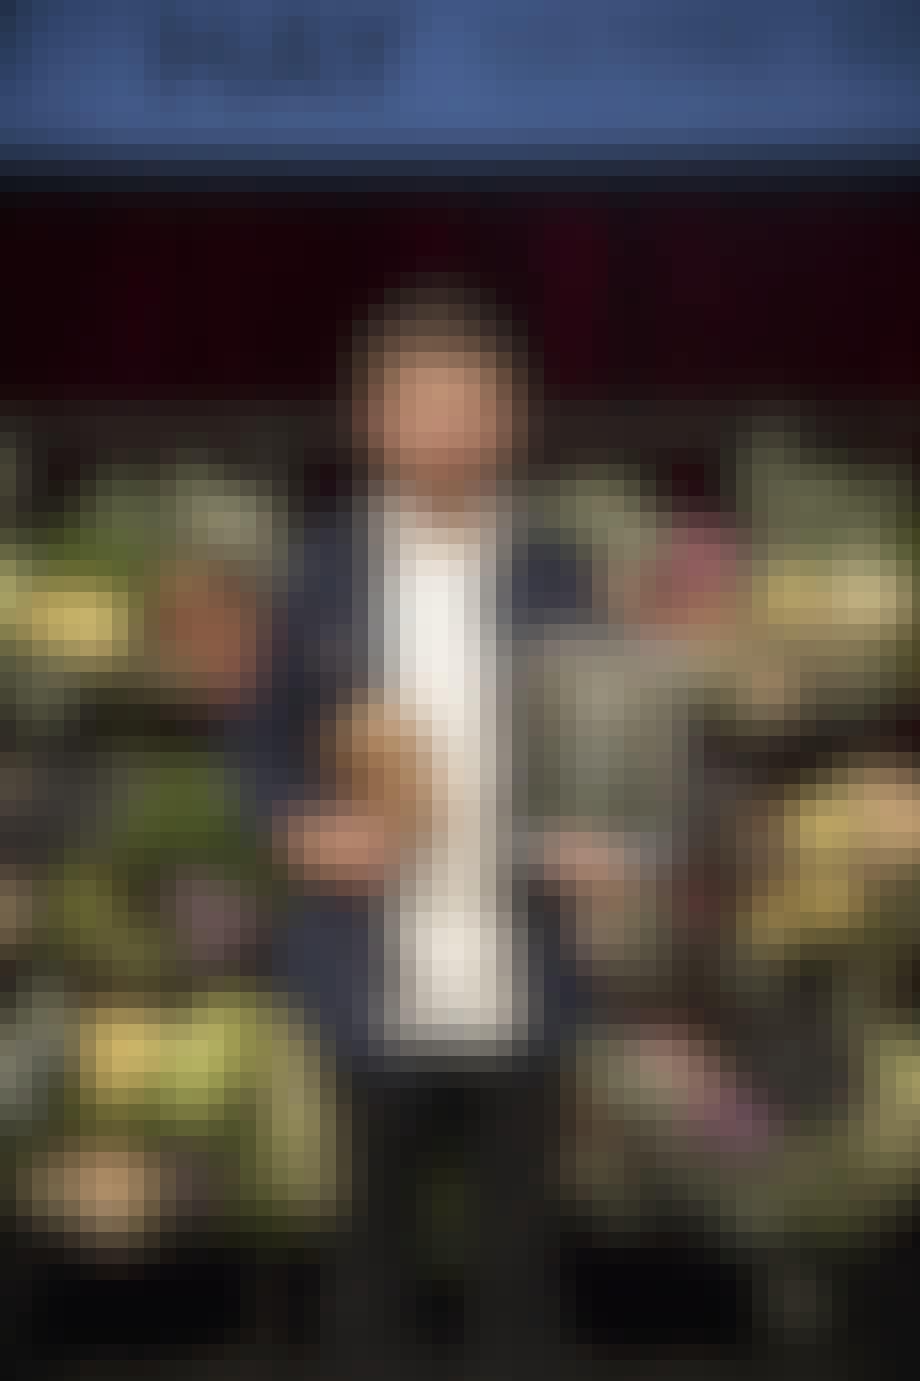 design awards 2017 folketeatret upcoming christian juhl